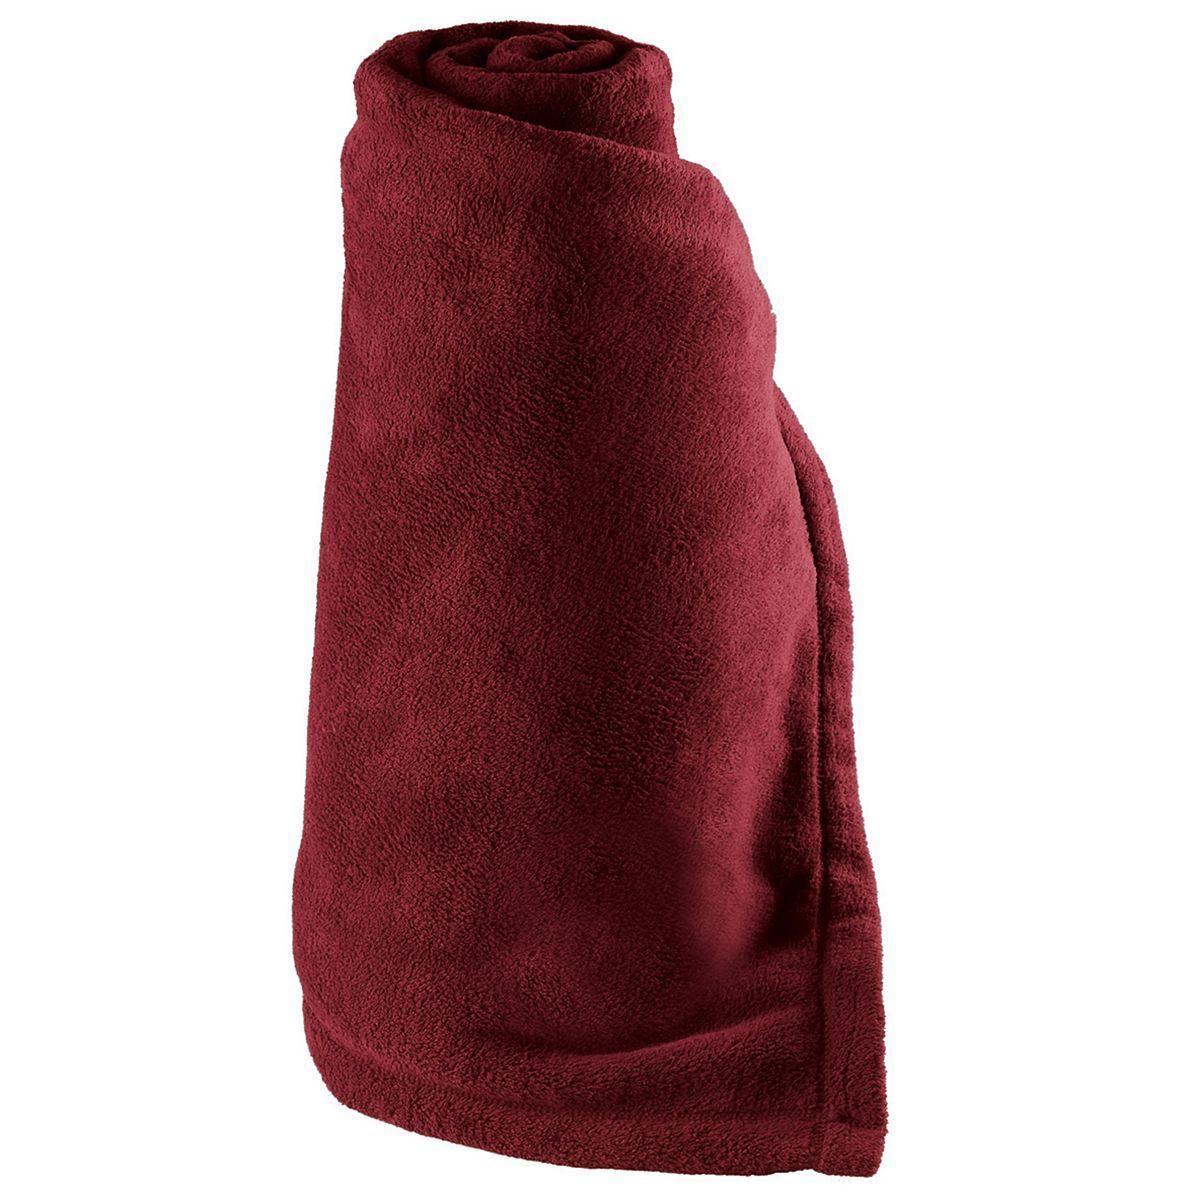 Tailgate Blanket - MAROON